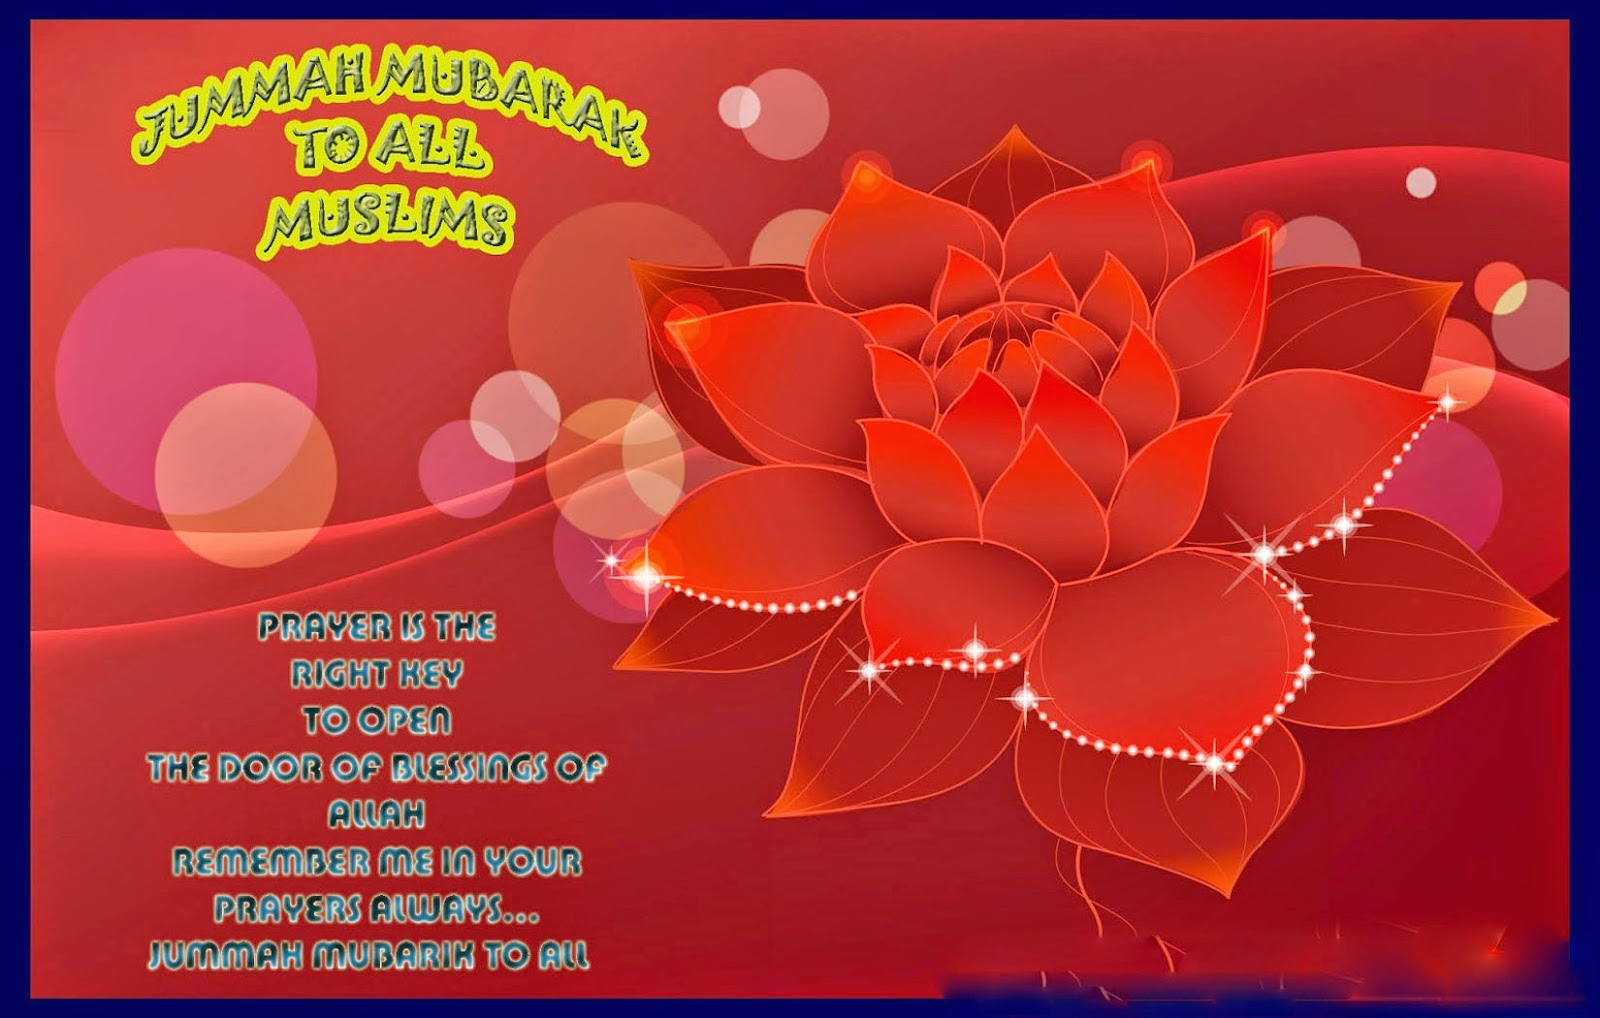 Jumma mubarak 2014 wallpaper download neha sharma hd wallpapers jumma mubarak card and greetings m4hsunfo